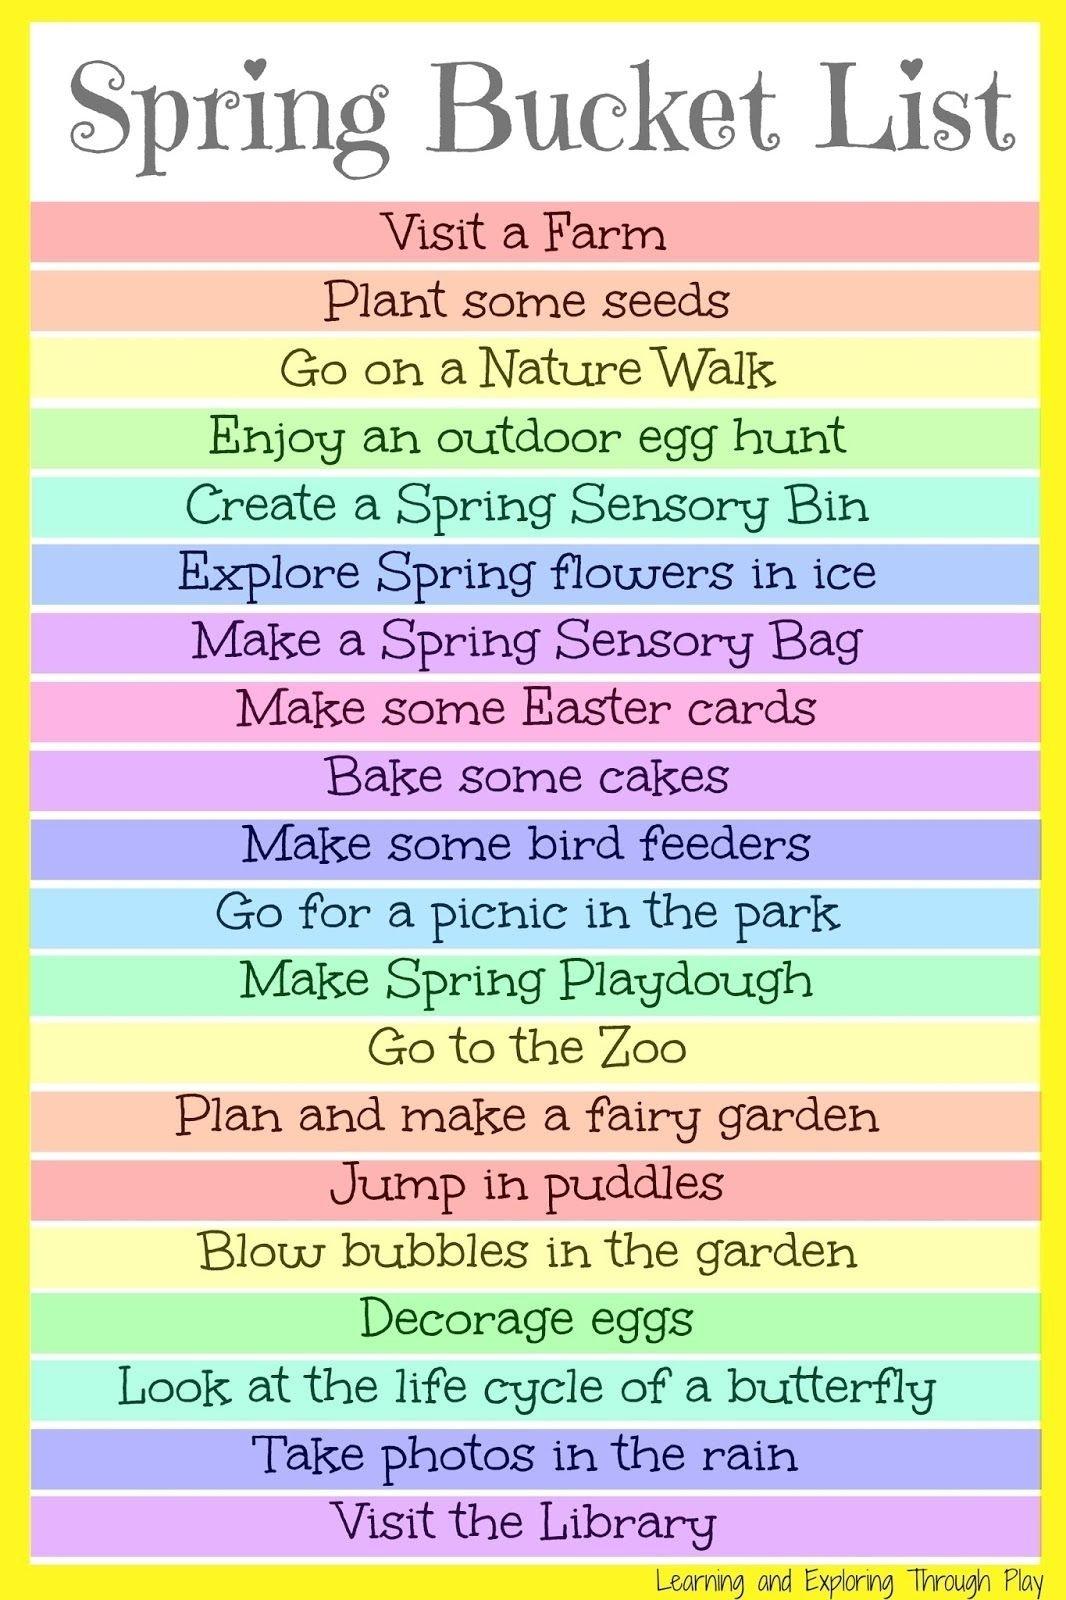 10 Attractive Spring Break Ideas For Kids spring bucket list for kids and families spring bucket lists fun 1 2021